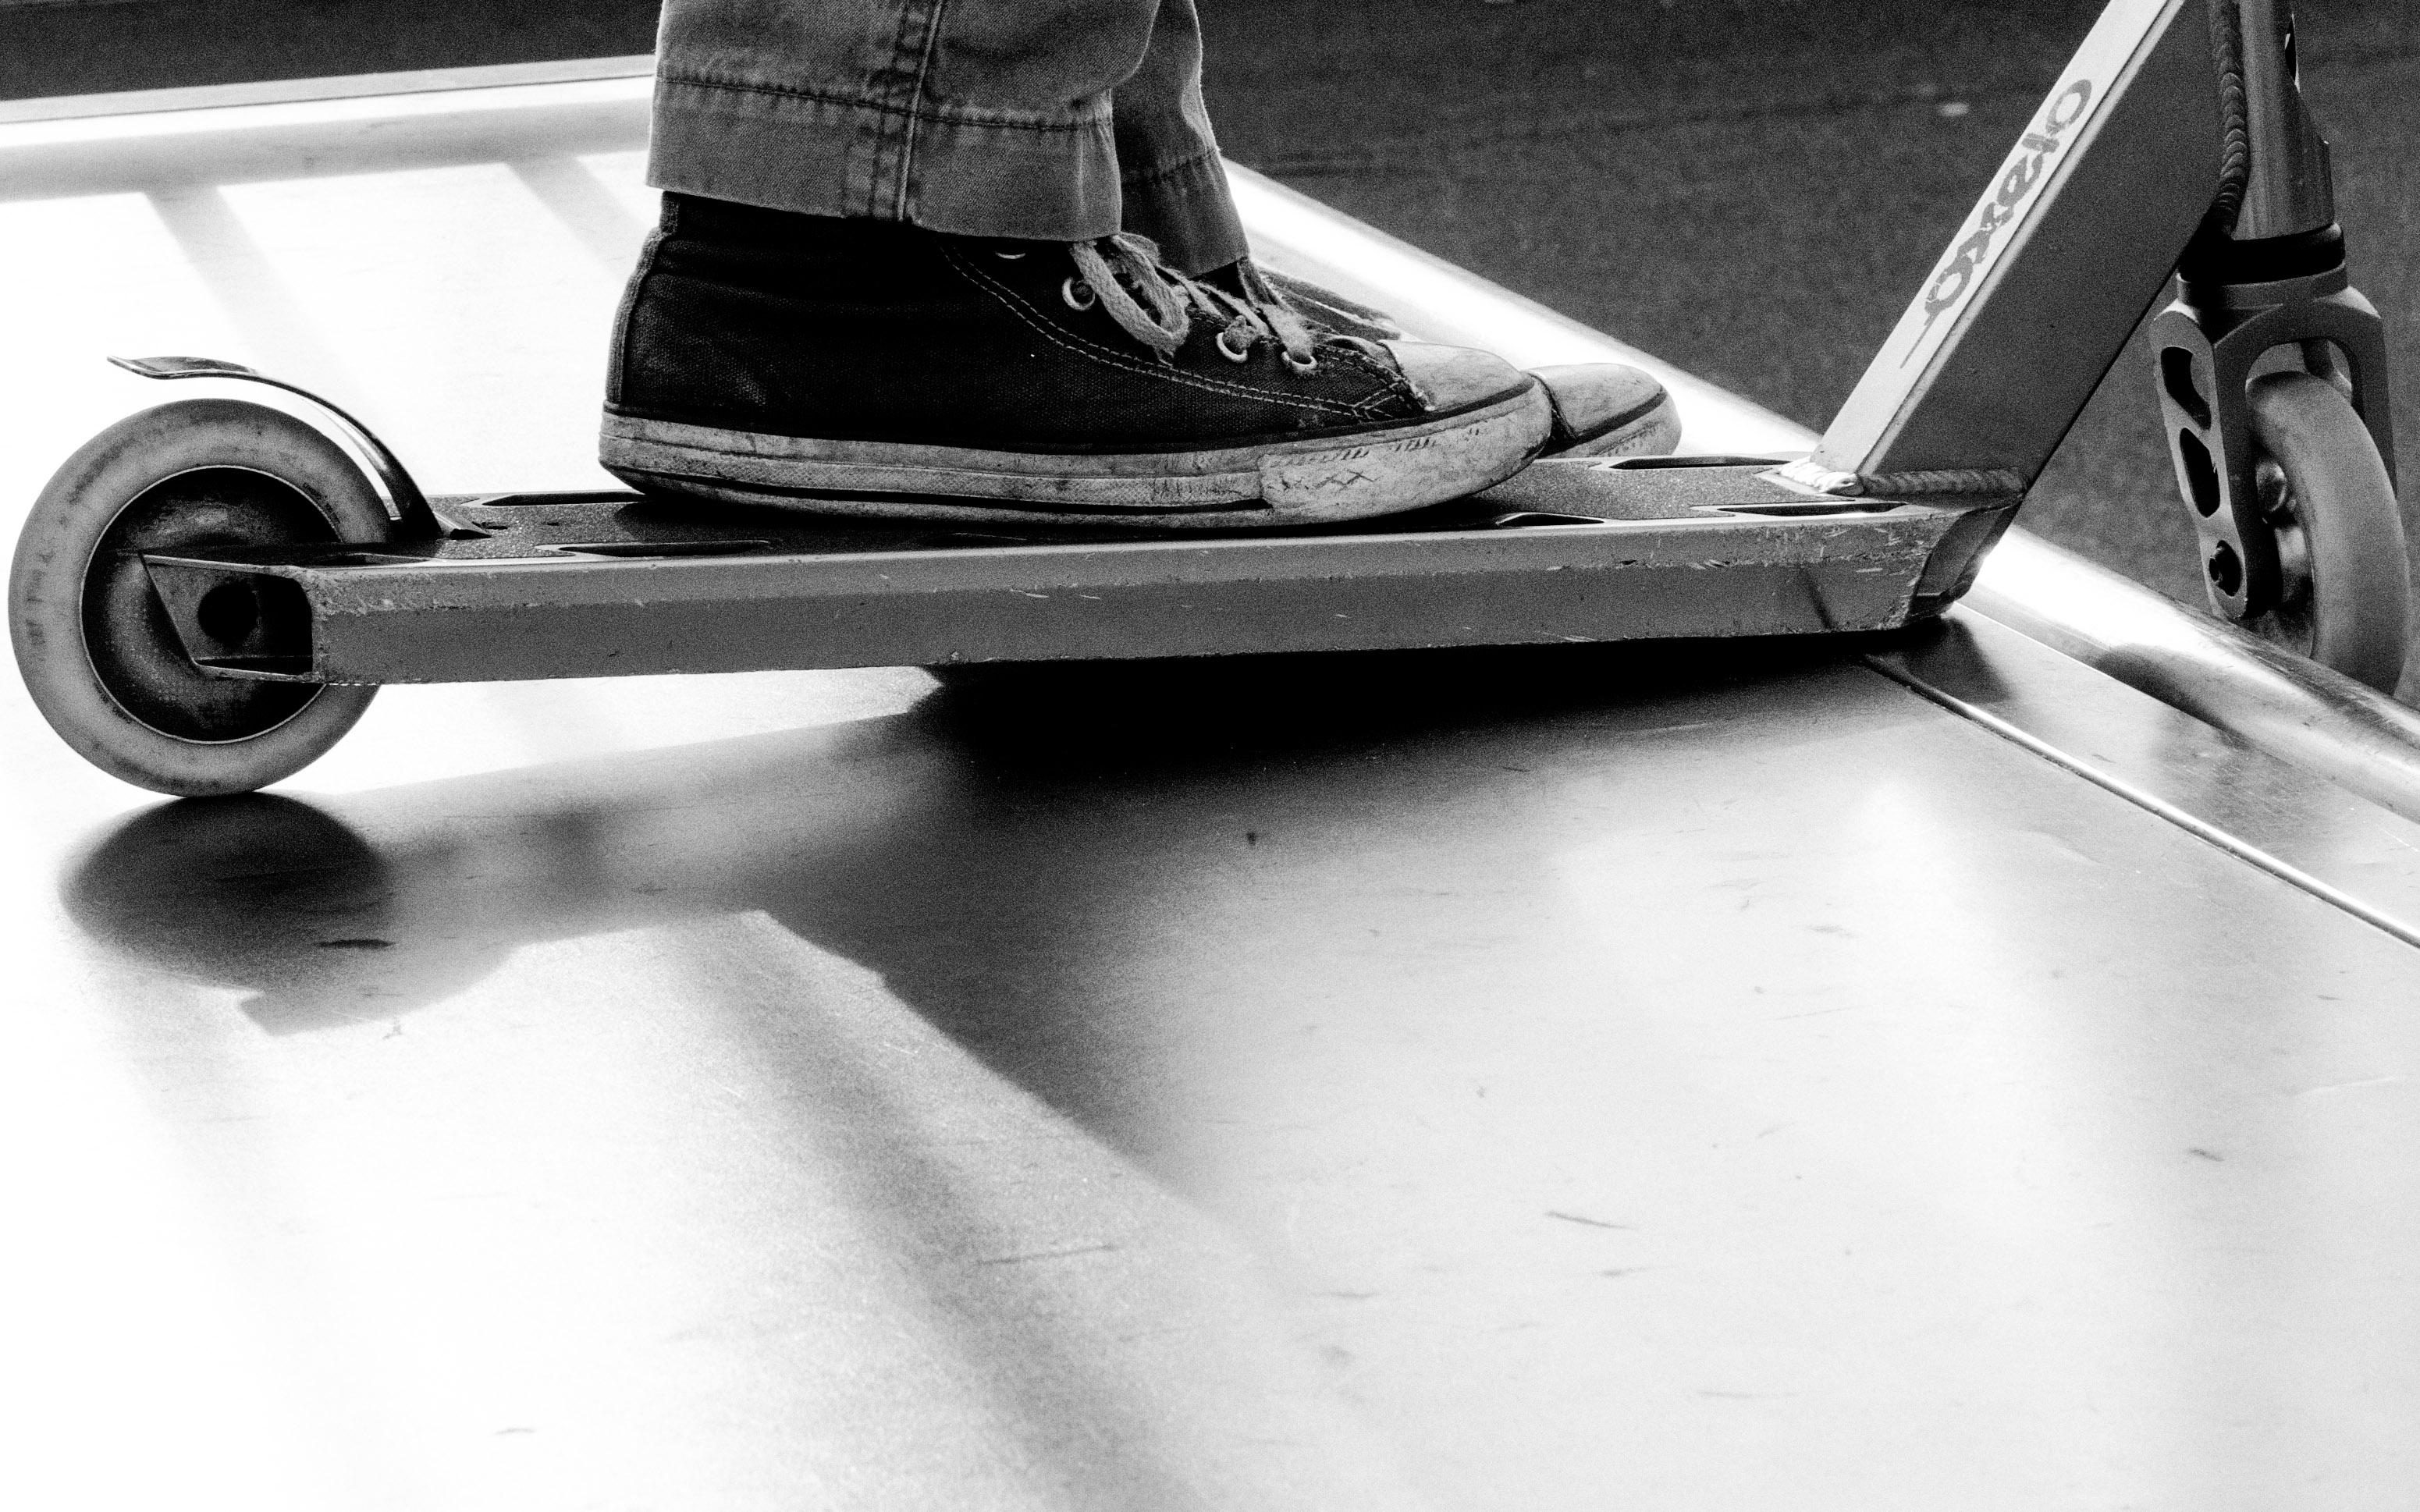 Scotter & Foot